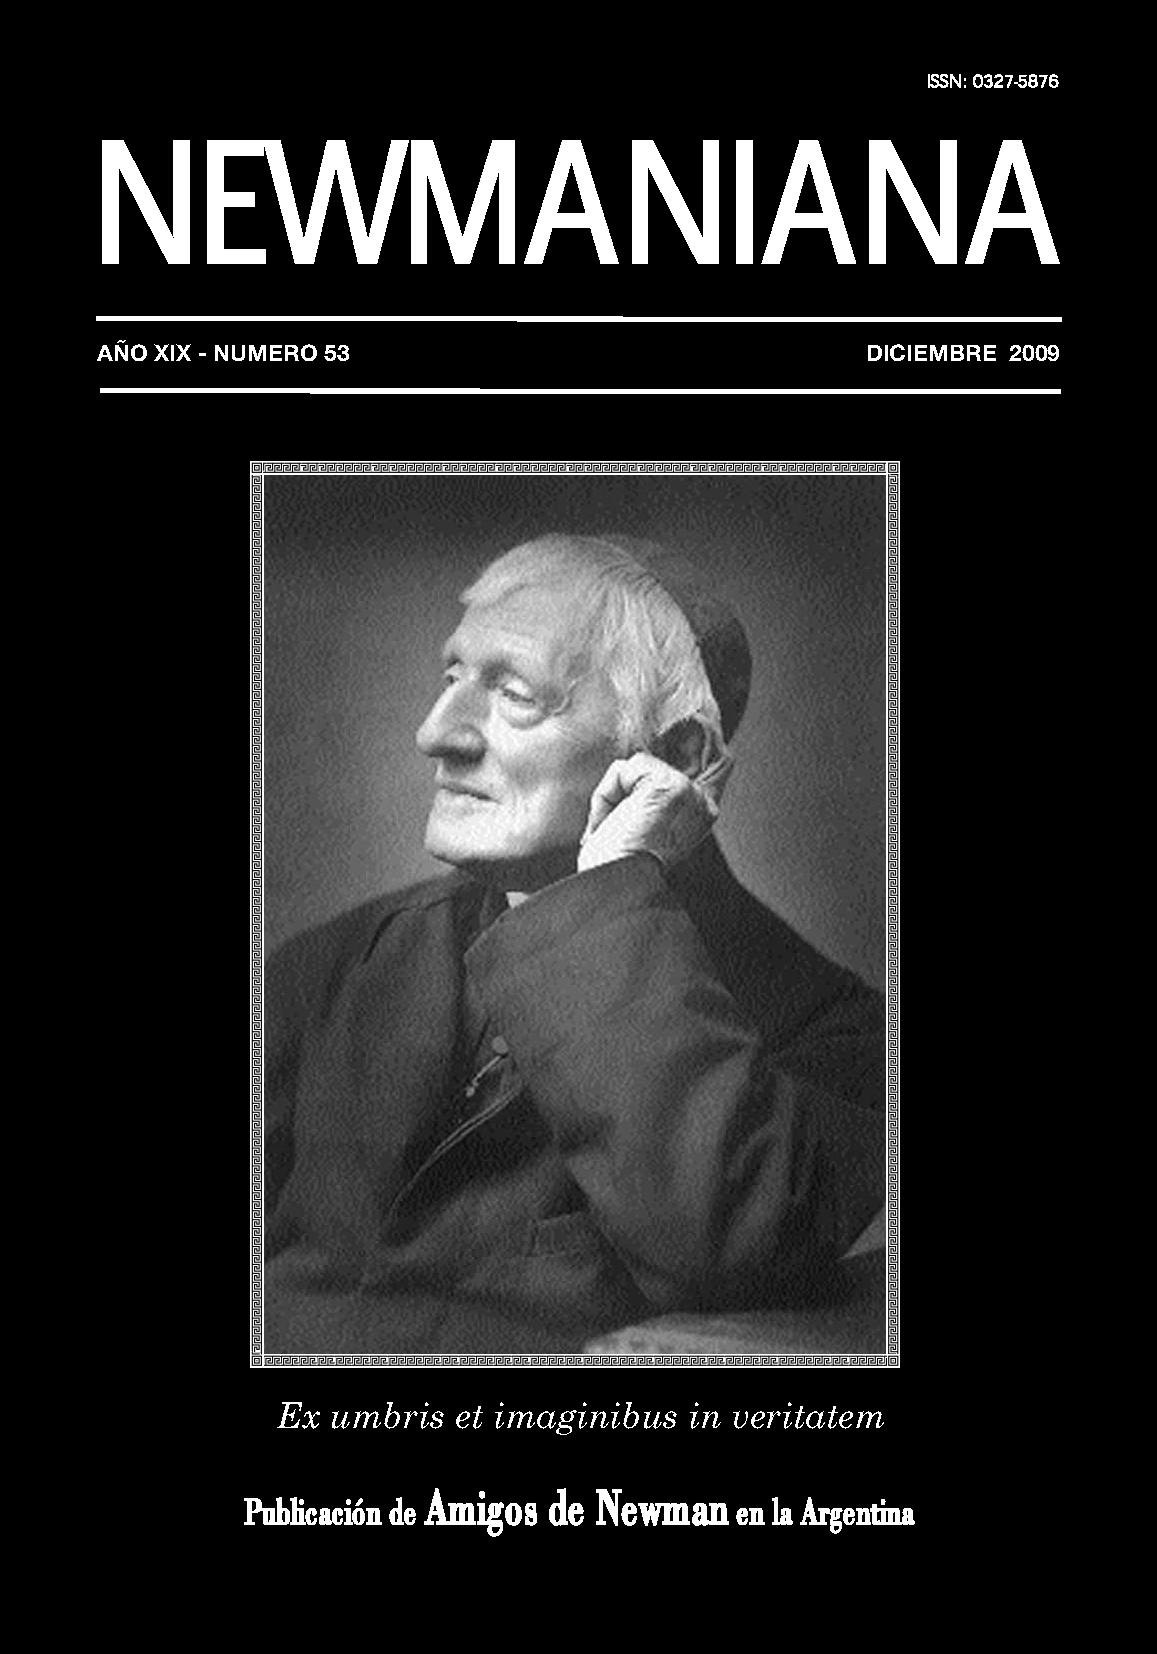 Revista Newmaniana 53 -Diciembre 2009